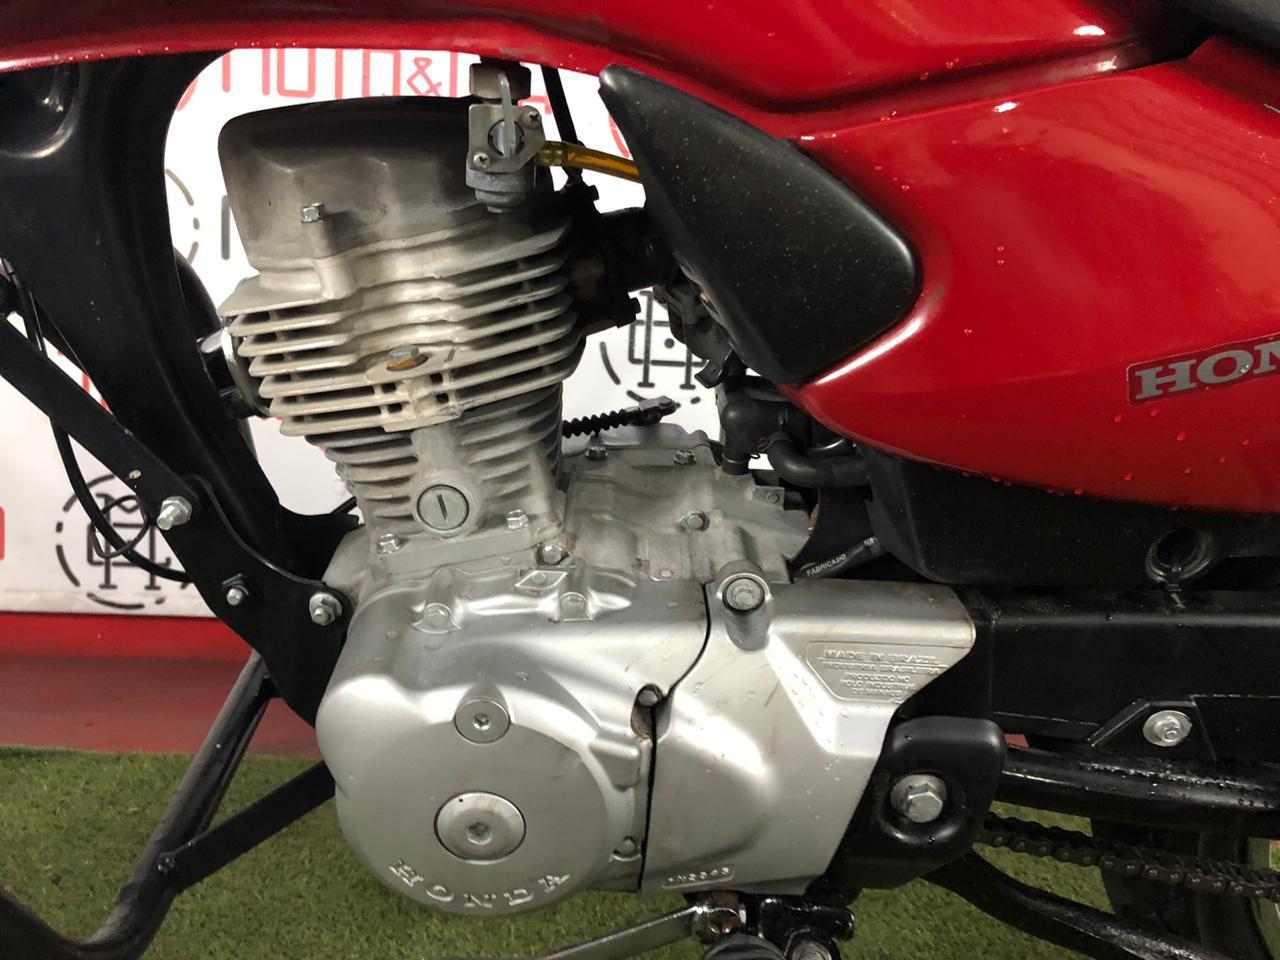 Honda - TITAN 125 KS